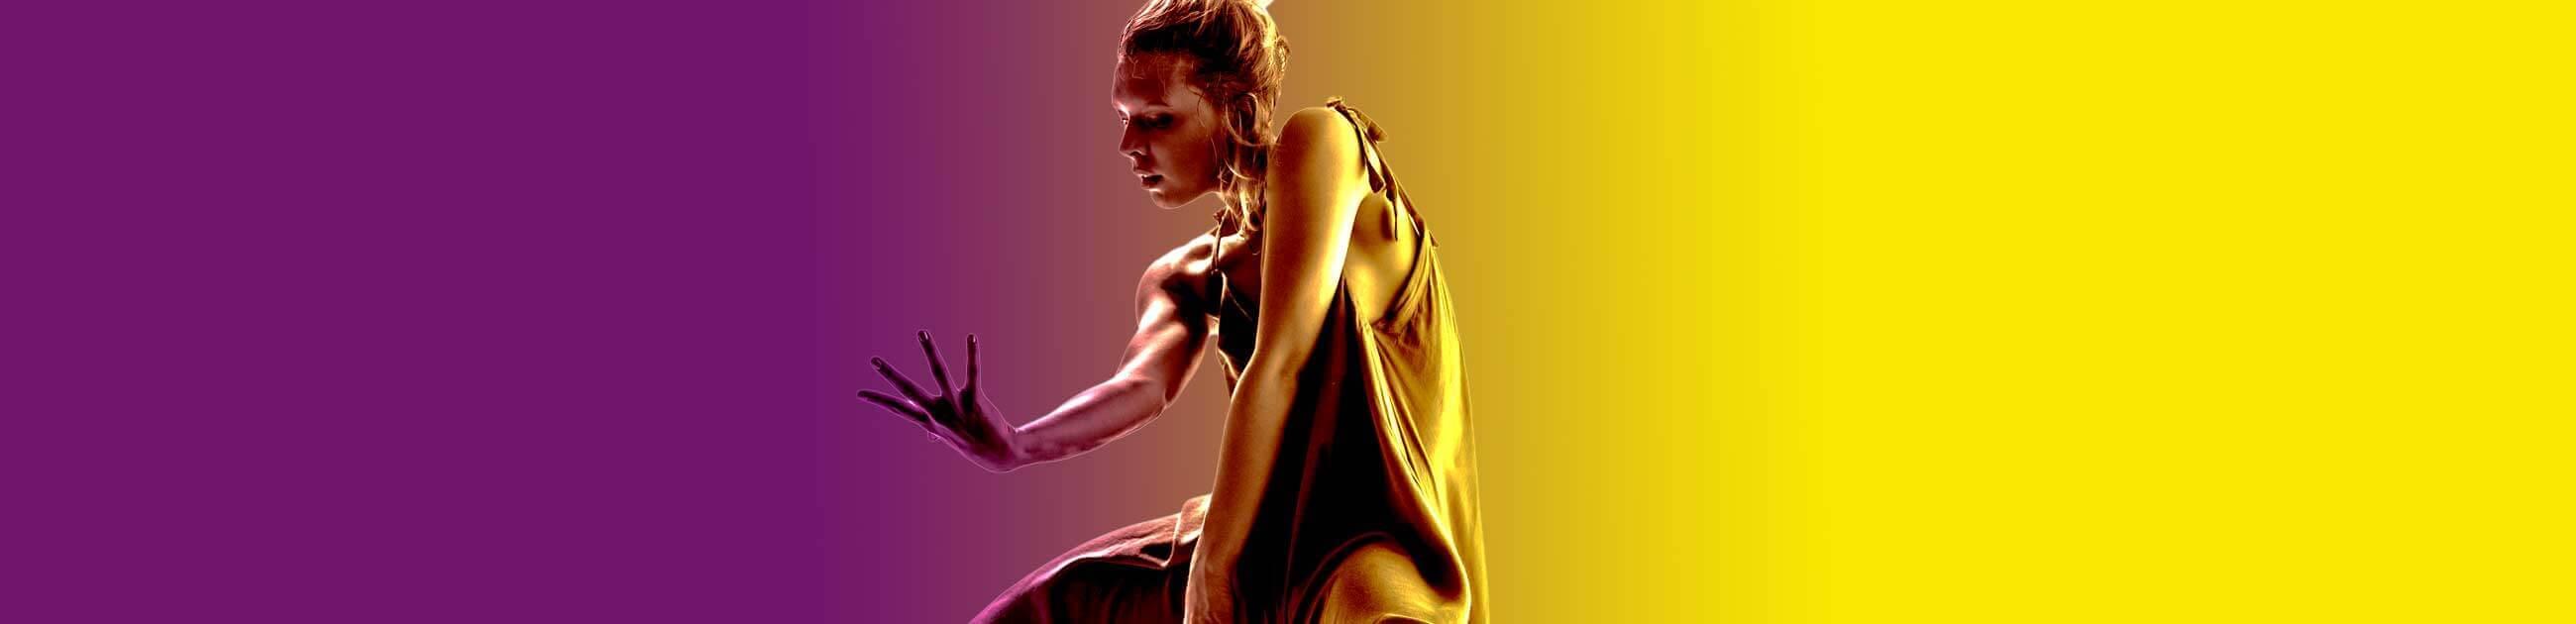 Ausdruckstanz-kreativer Tanz - Tanzschule K-System in Kiel